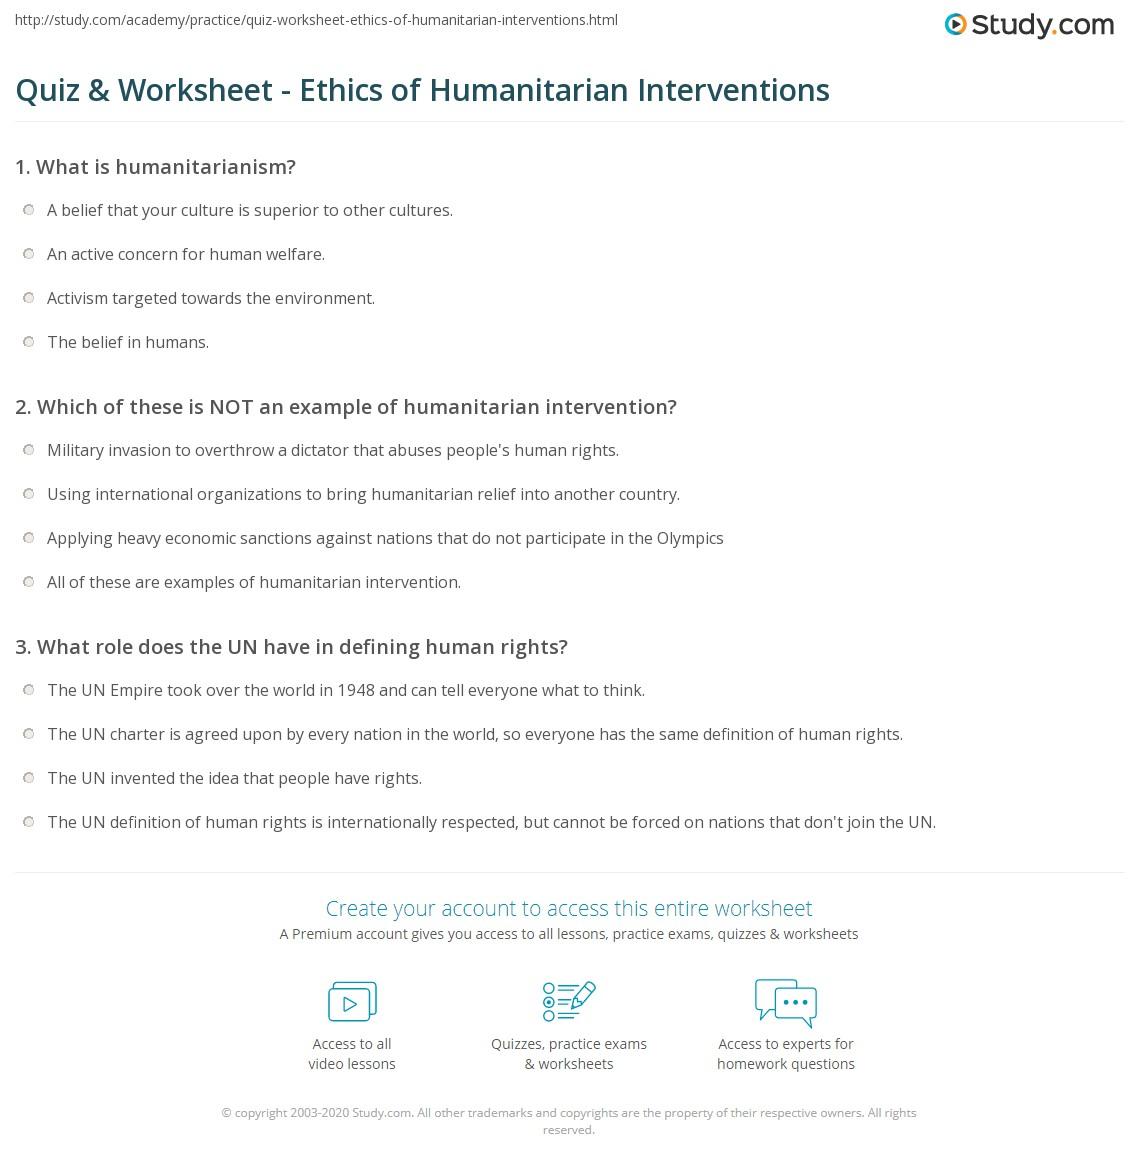 Quiz Worksheet Ethics Of Humanitarian Interventions Study